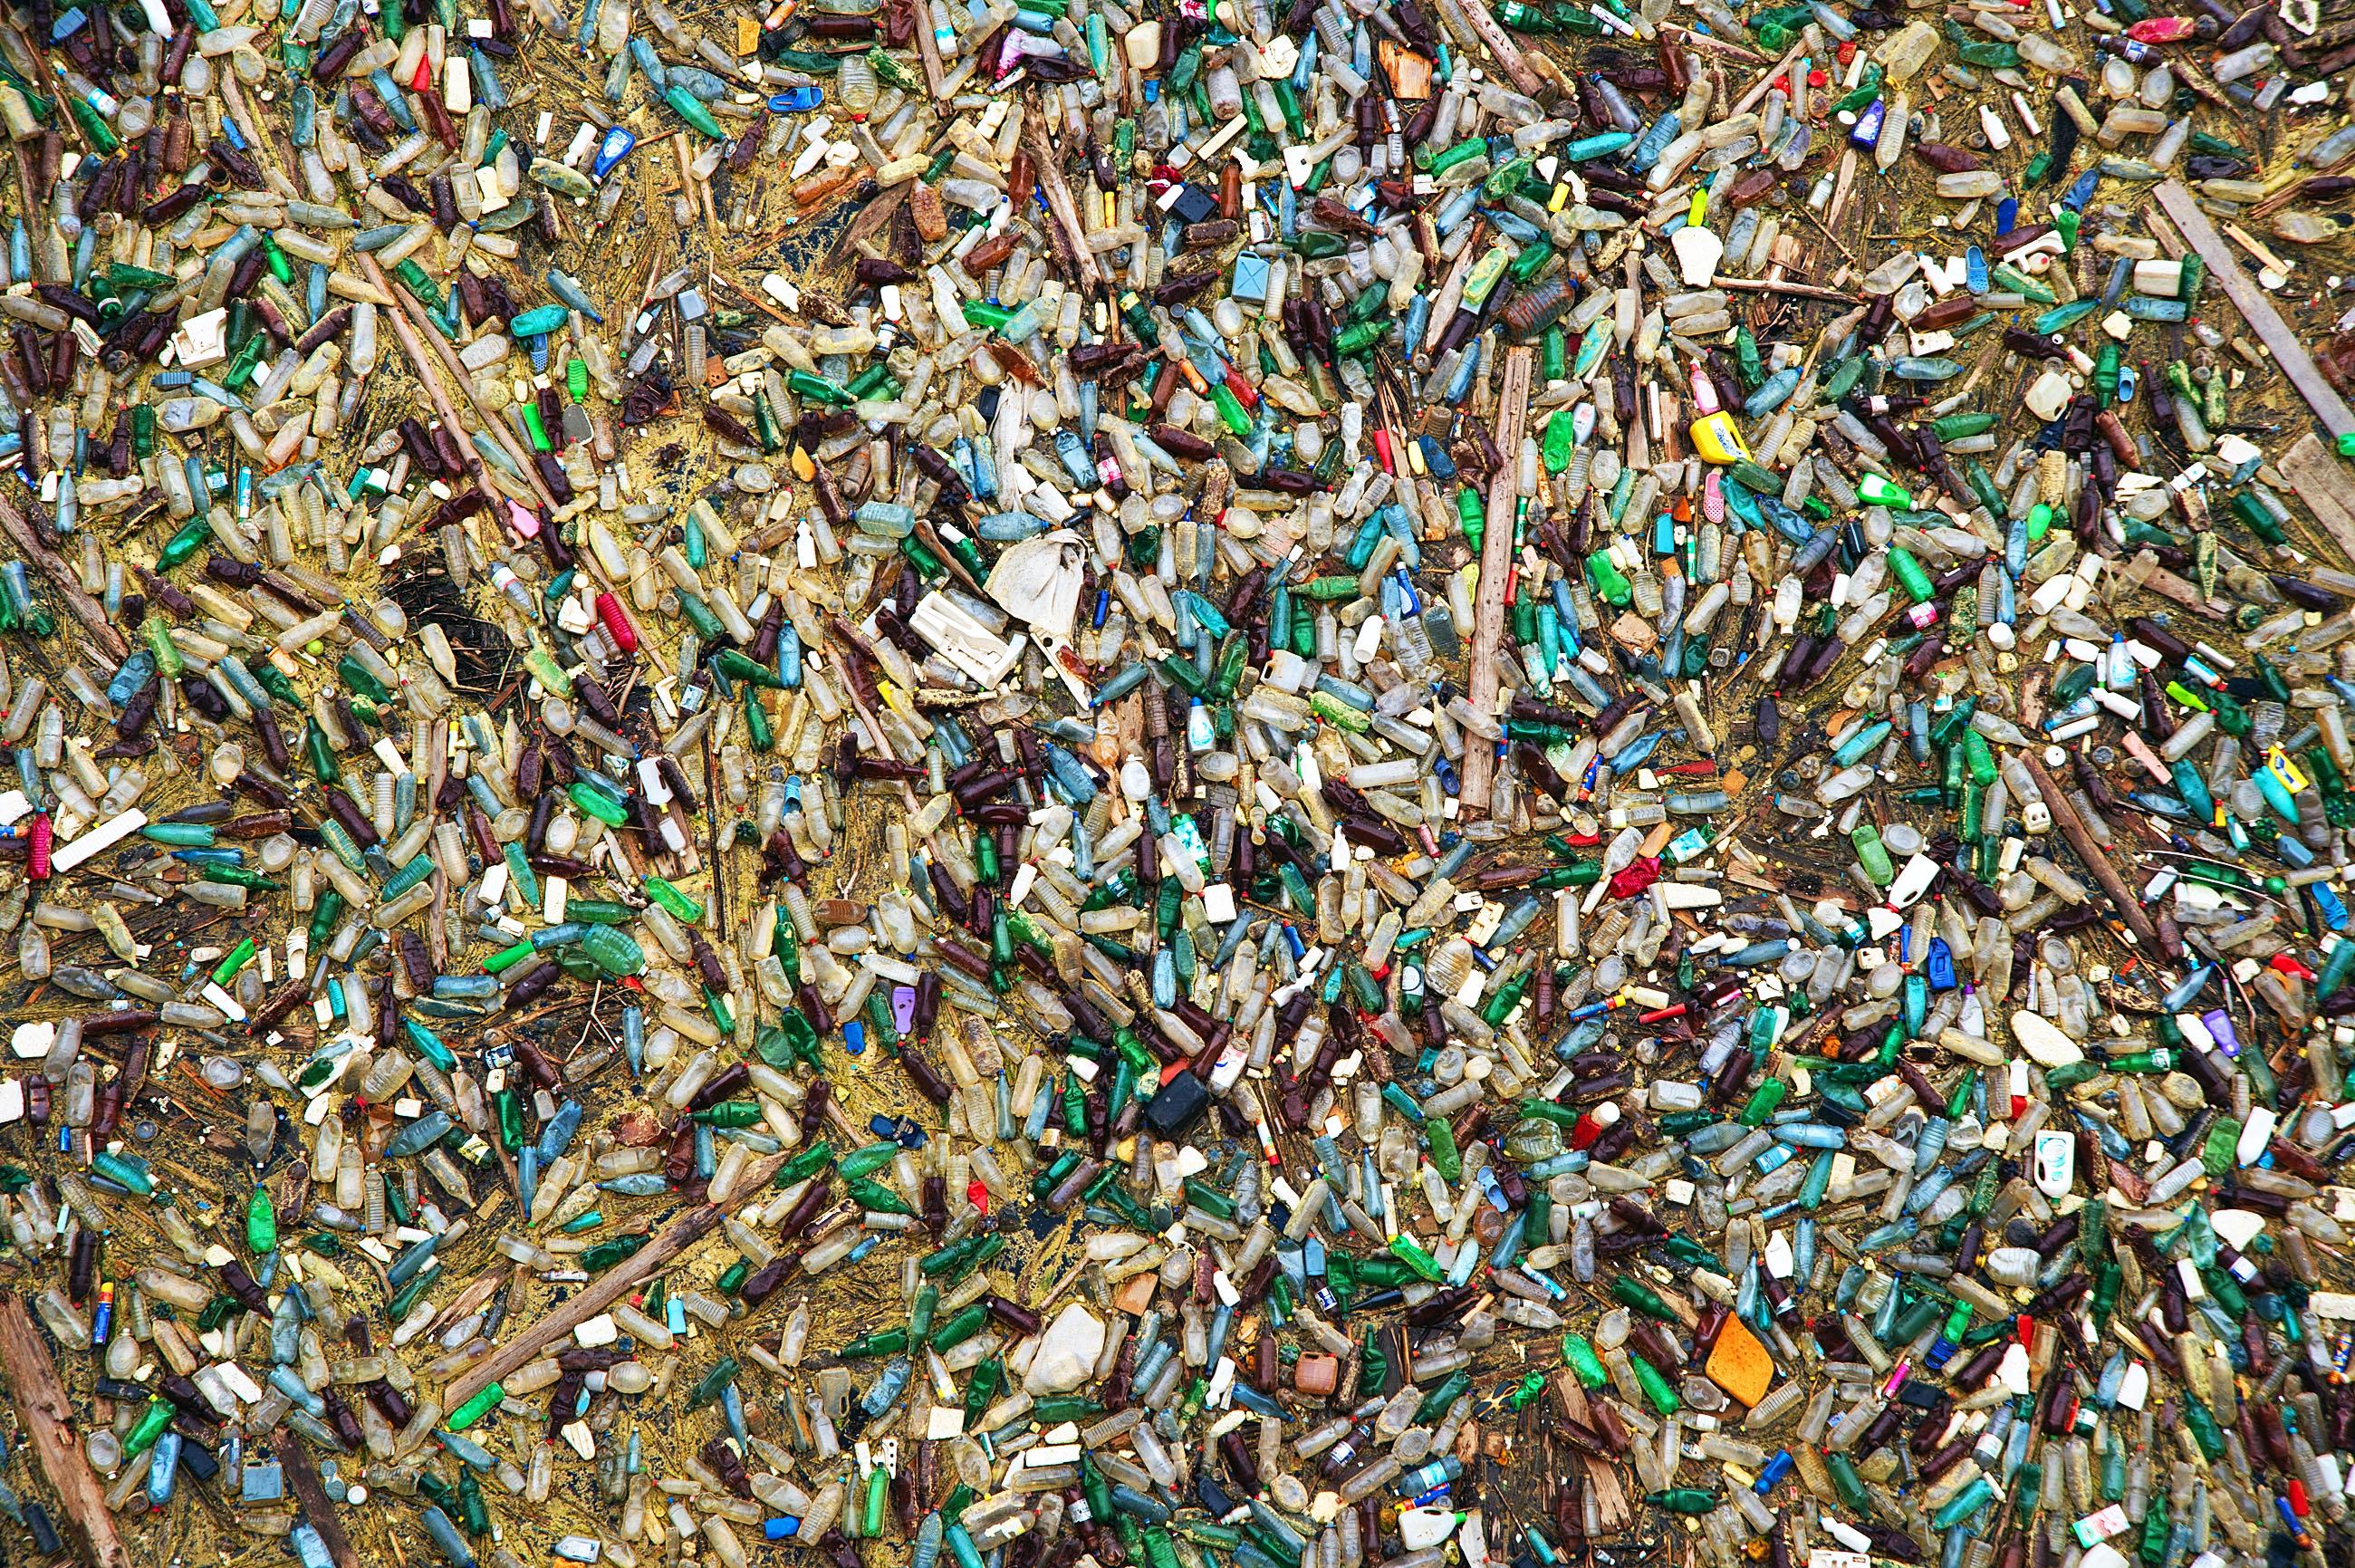 Waste_Plastic_National_Pile. Photo: Mikadun / Shutterstock